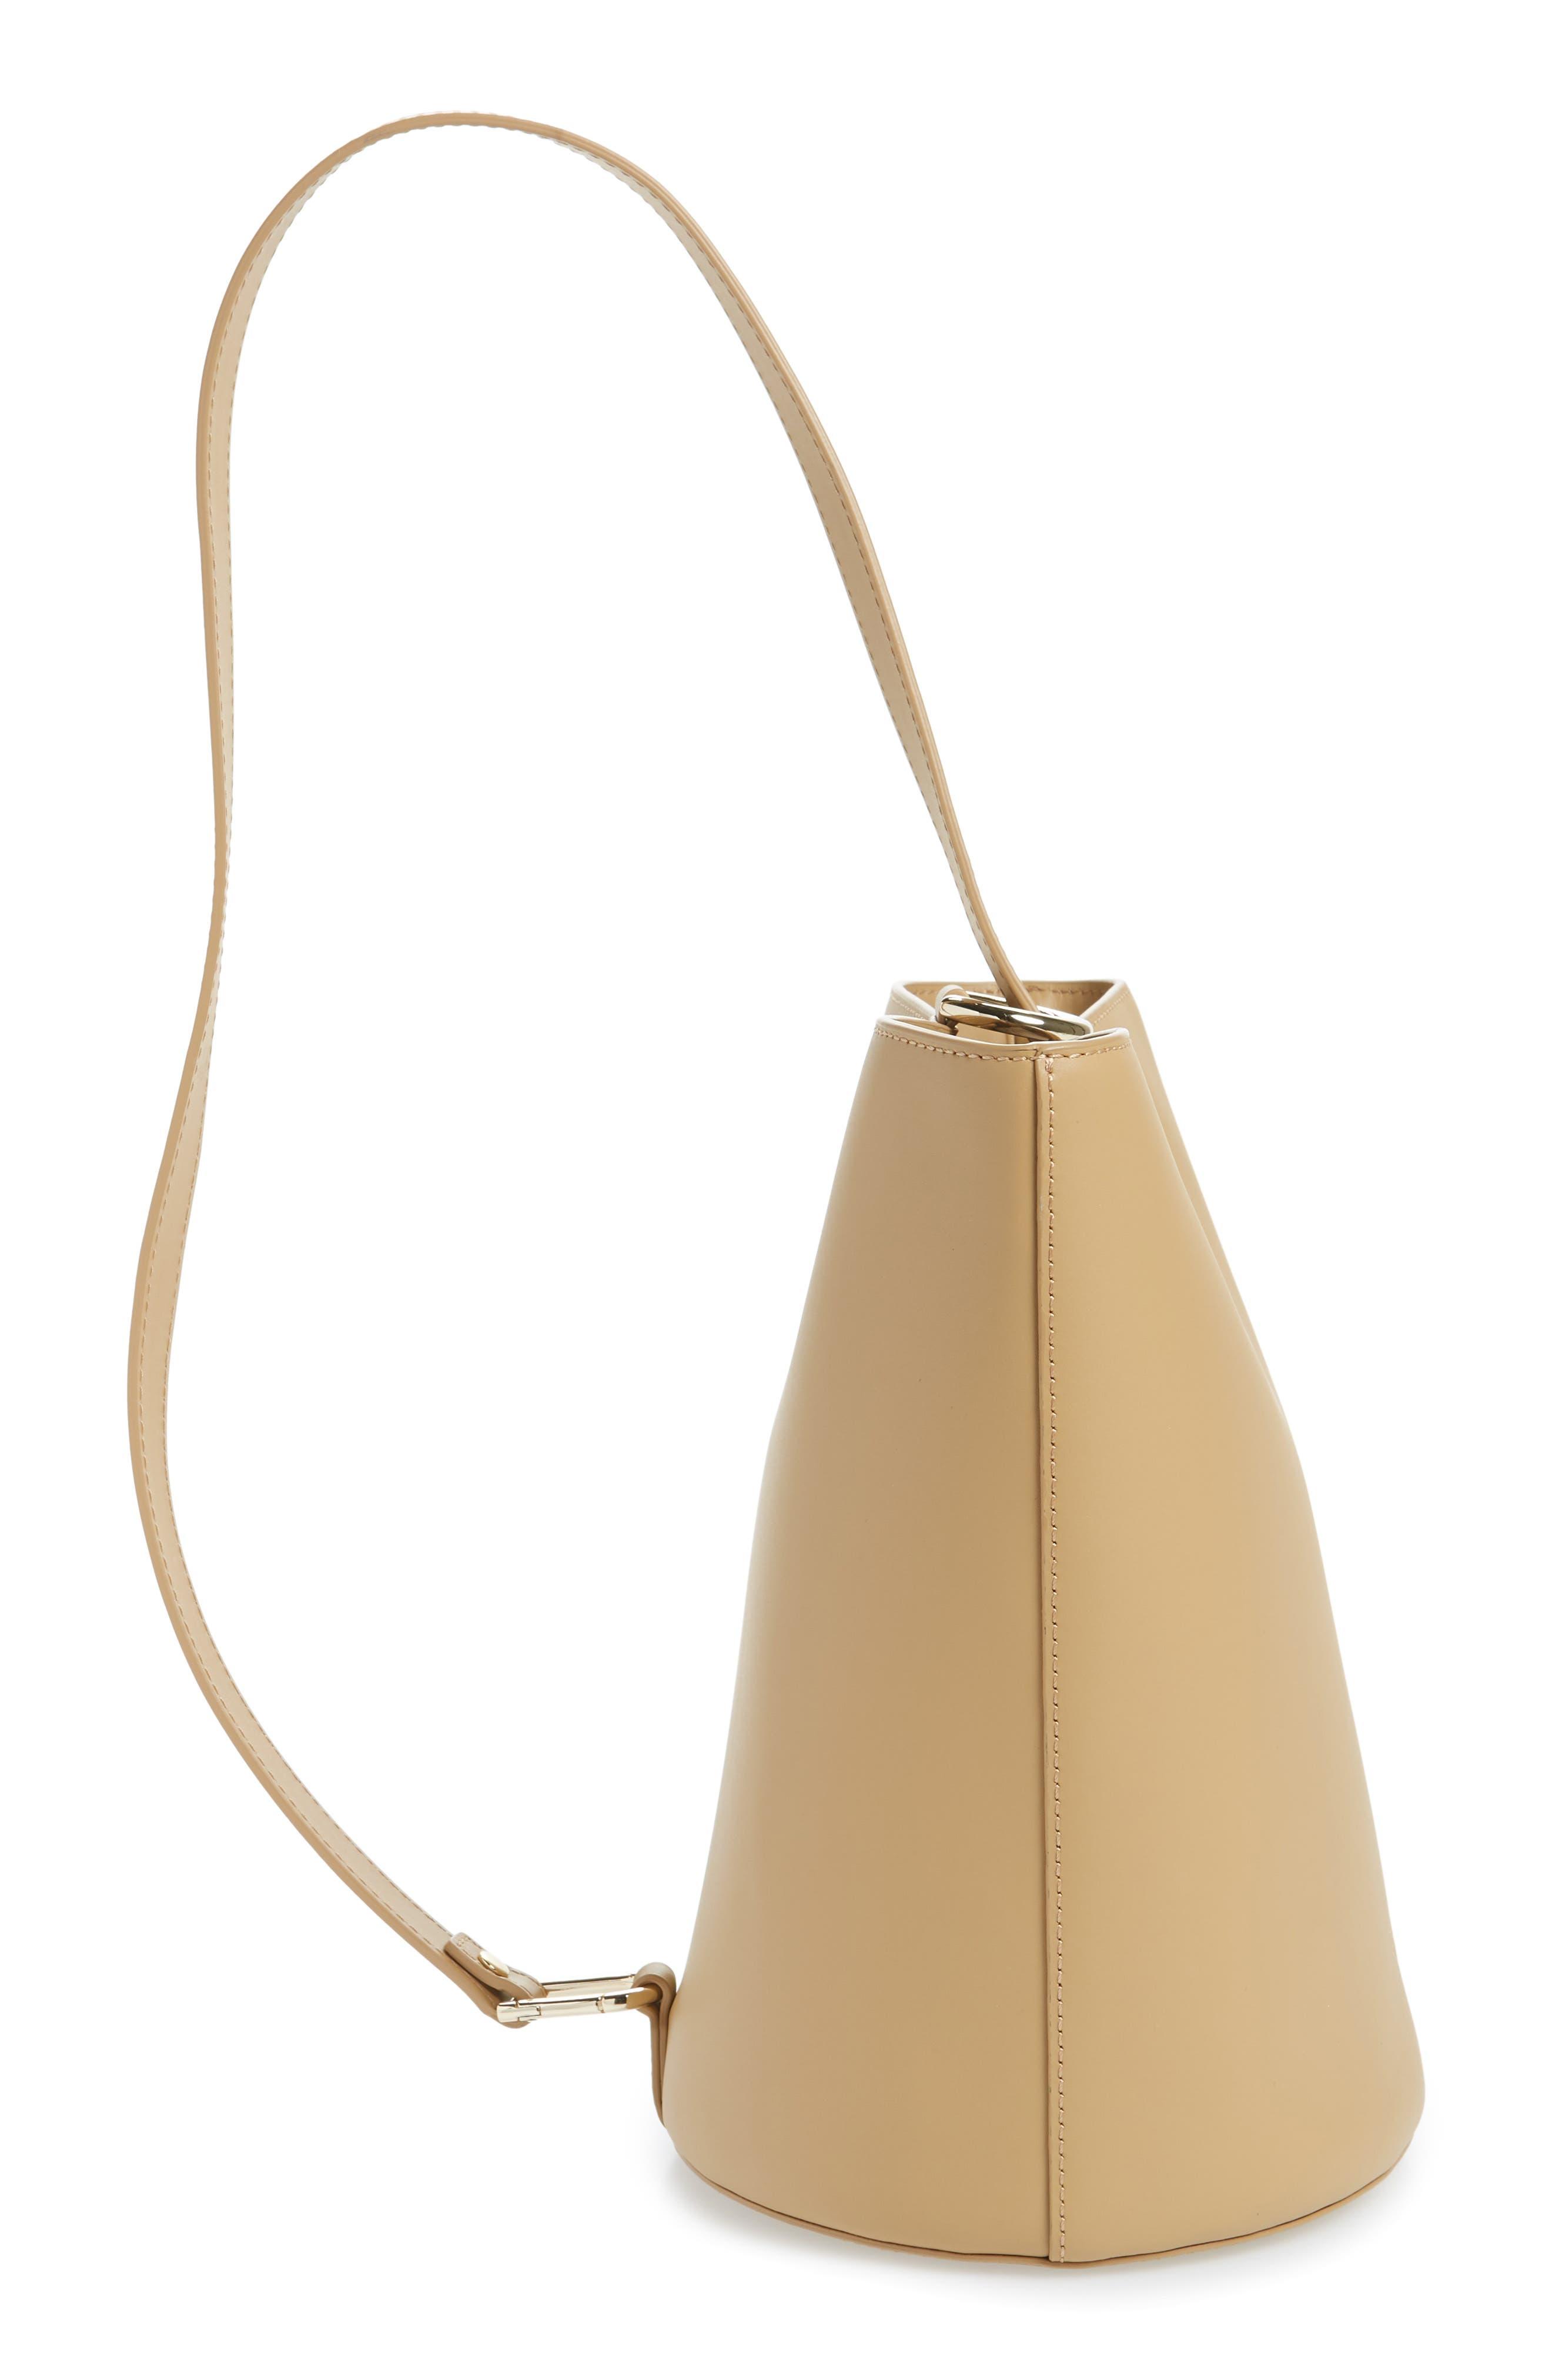 Dome Leather Bucket Bag,                             Alternate thumbnail 6, color,                             LIGHT CAMEL